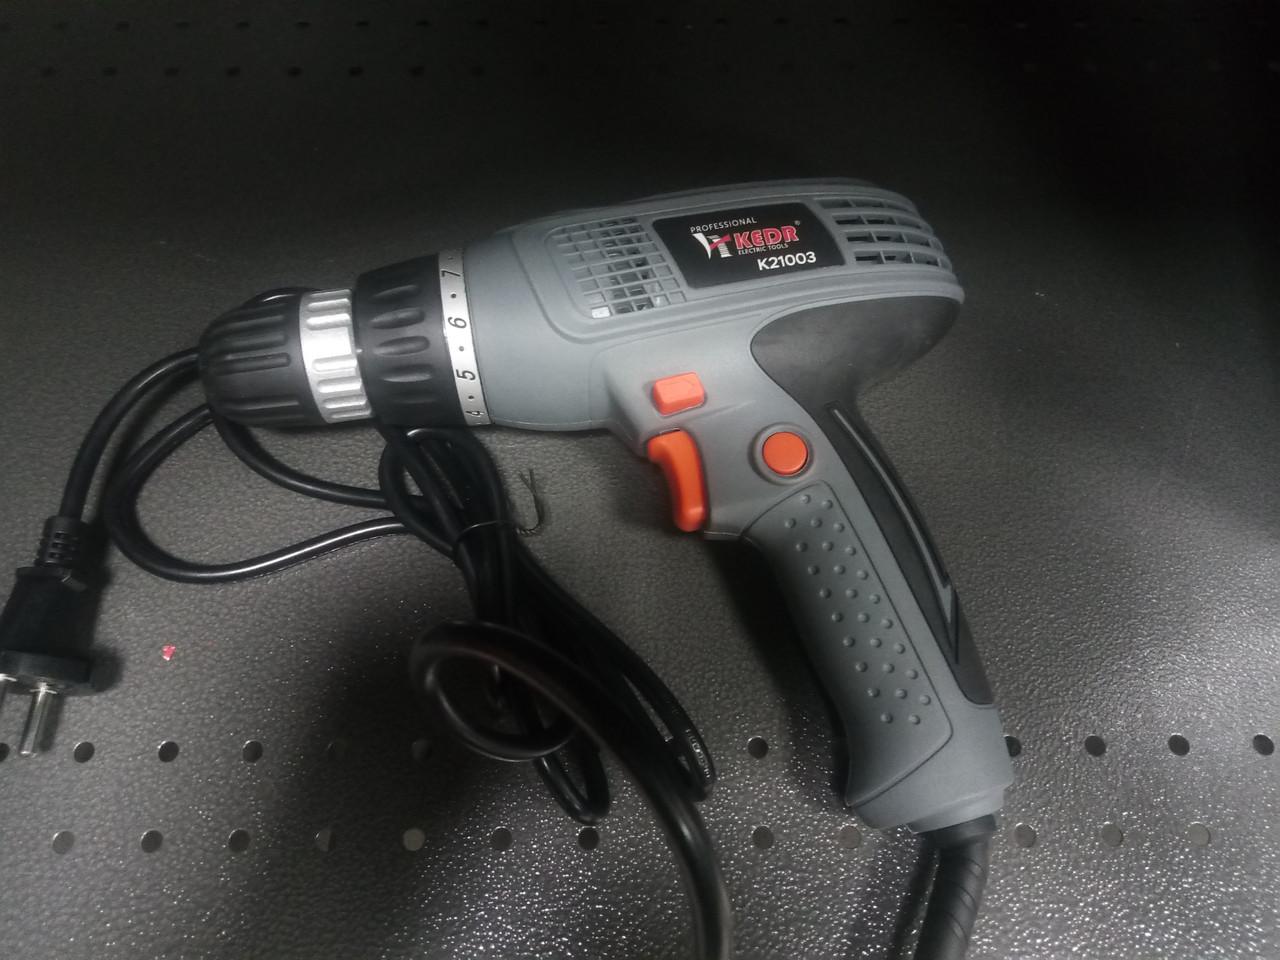 Электрошуруповерт KEDR K21003